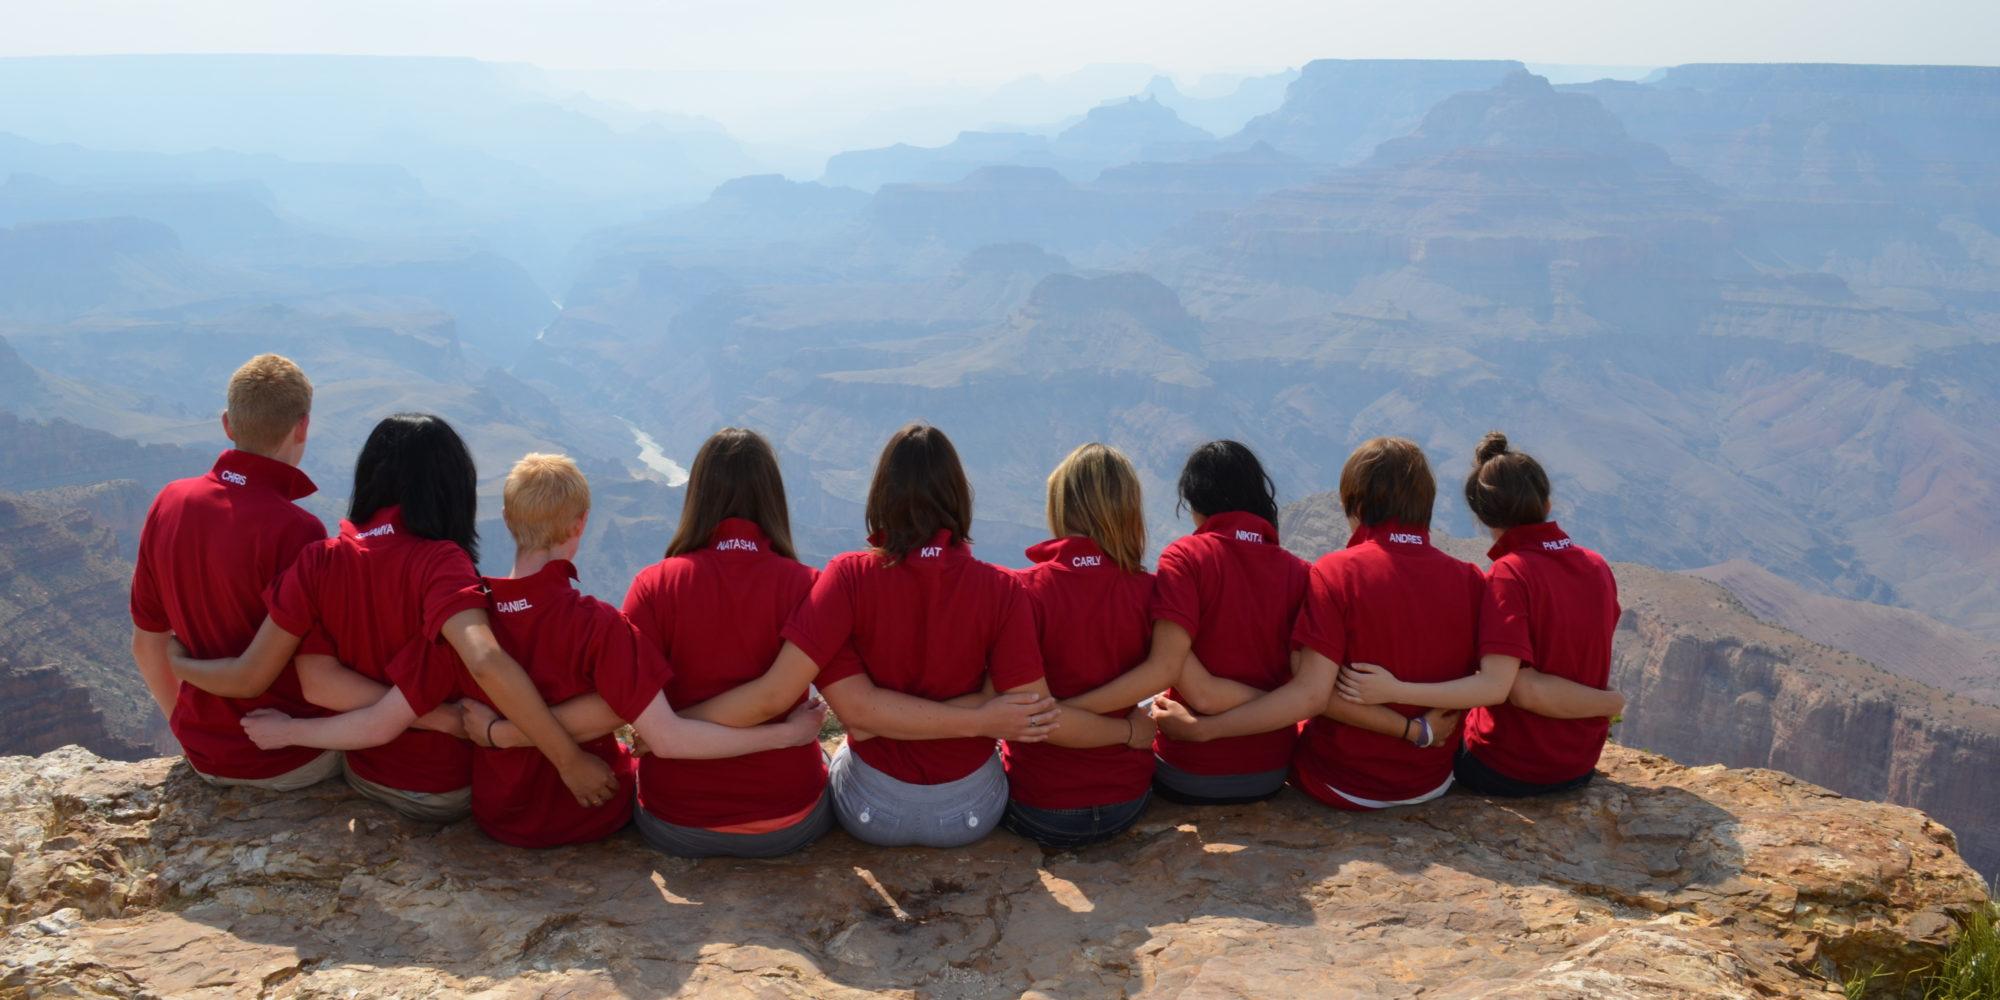 2011 - 2012 Officers at Grand Canyon